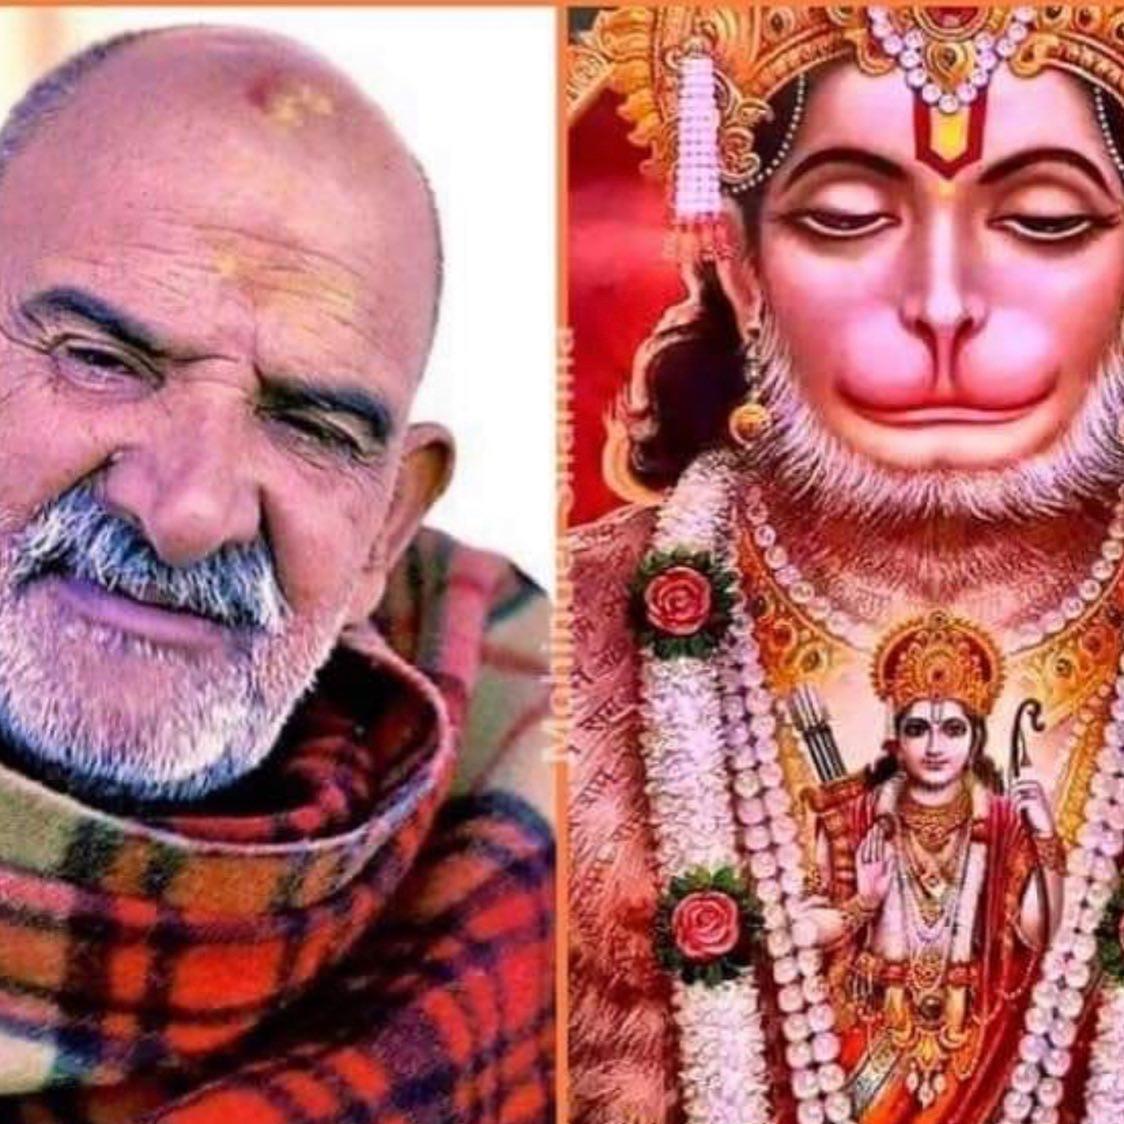 NKB and Hanuman side by Side image for Hanuman Chalisa 40 Day Challenge